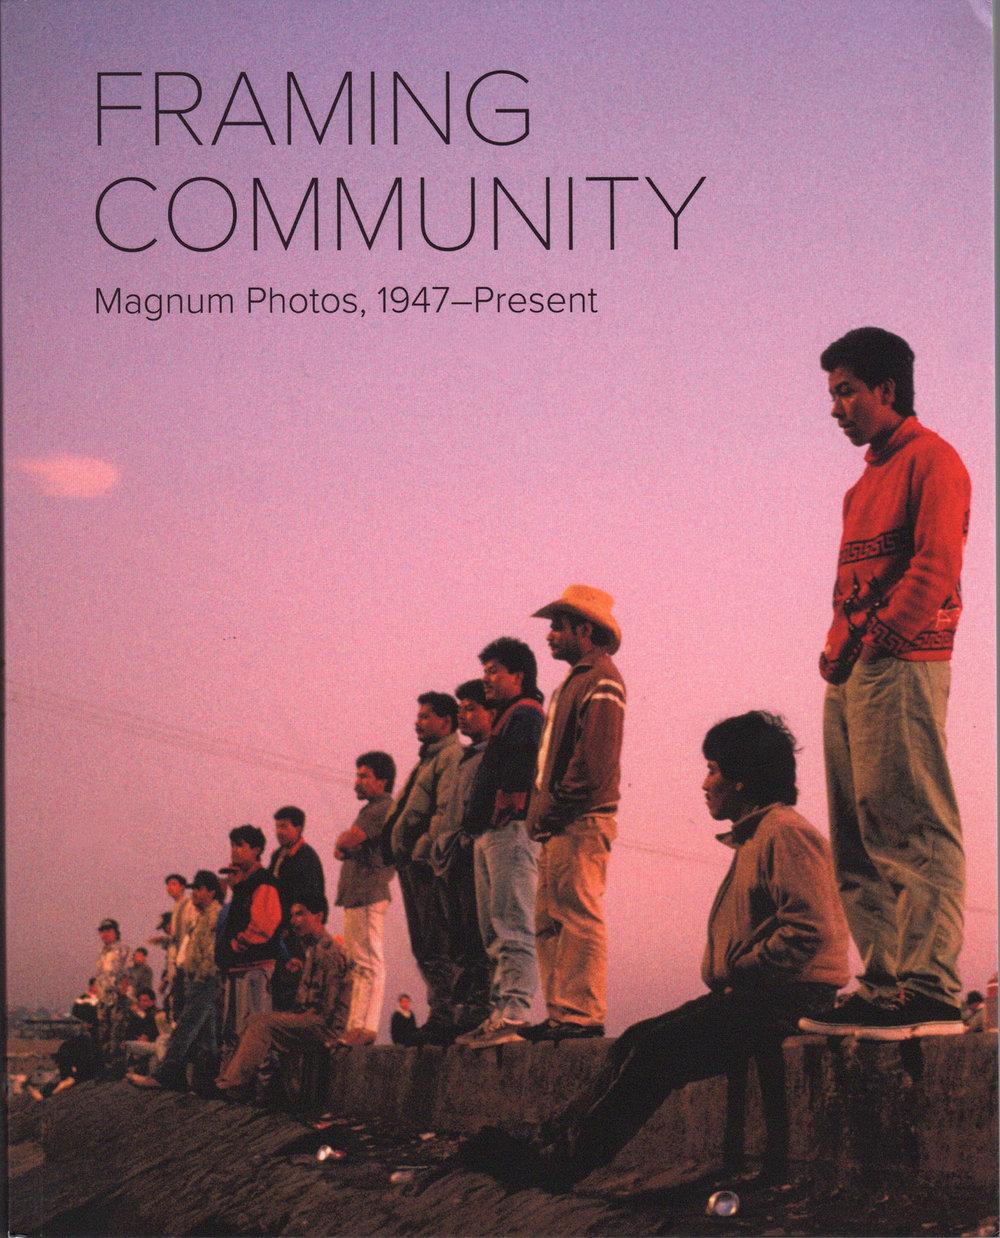 Framing Community (God, Inc.)